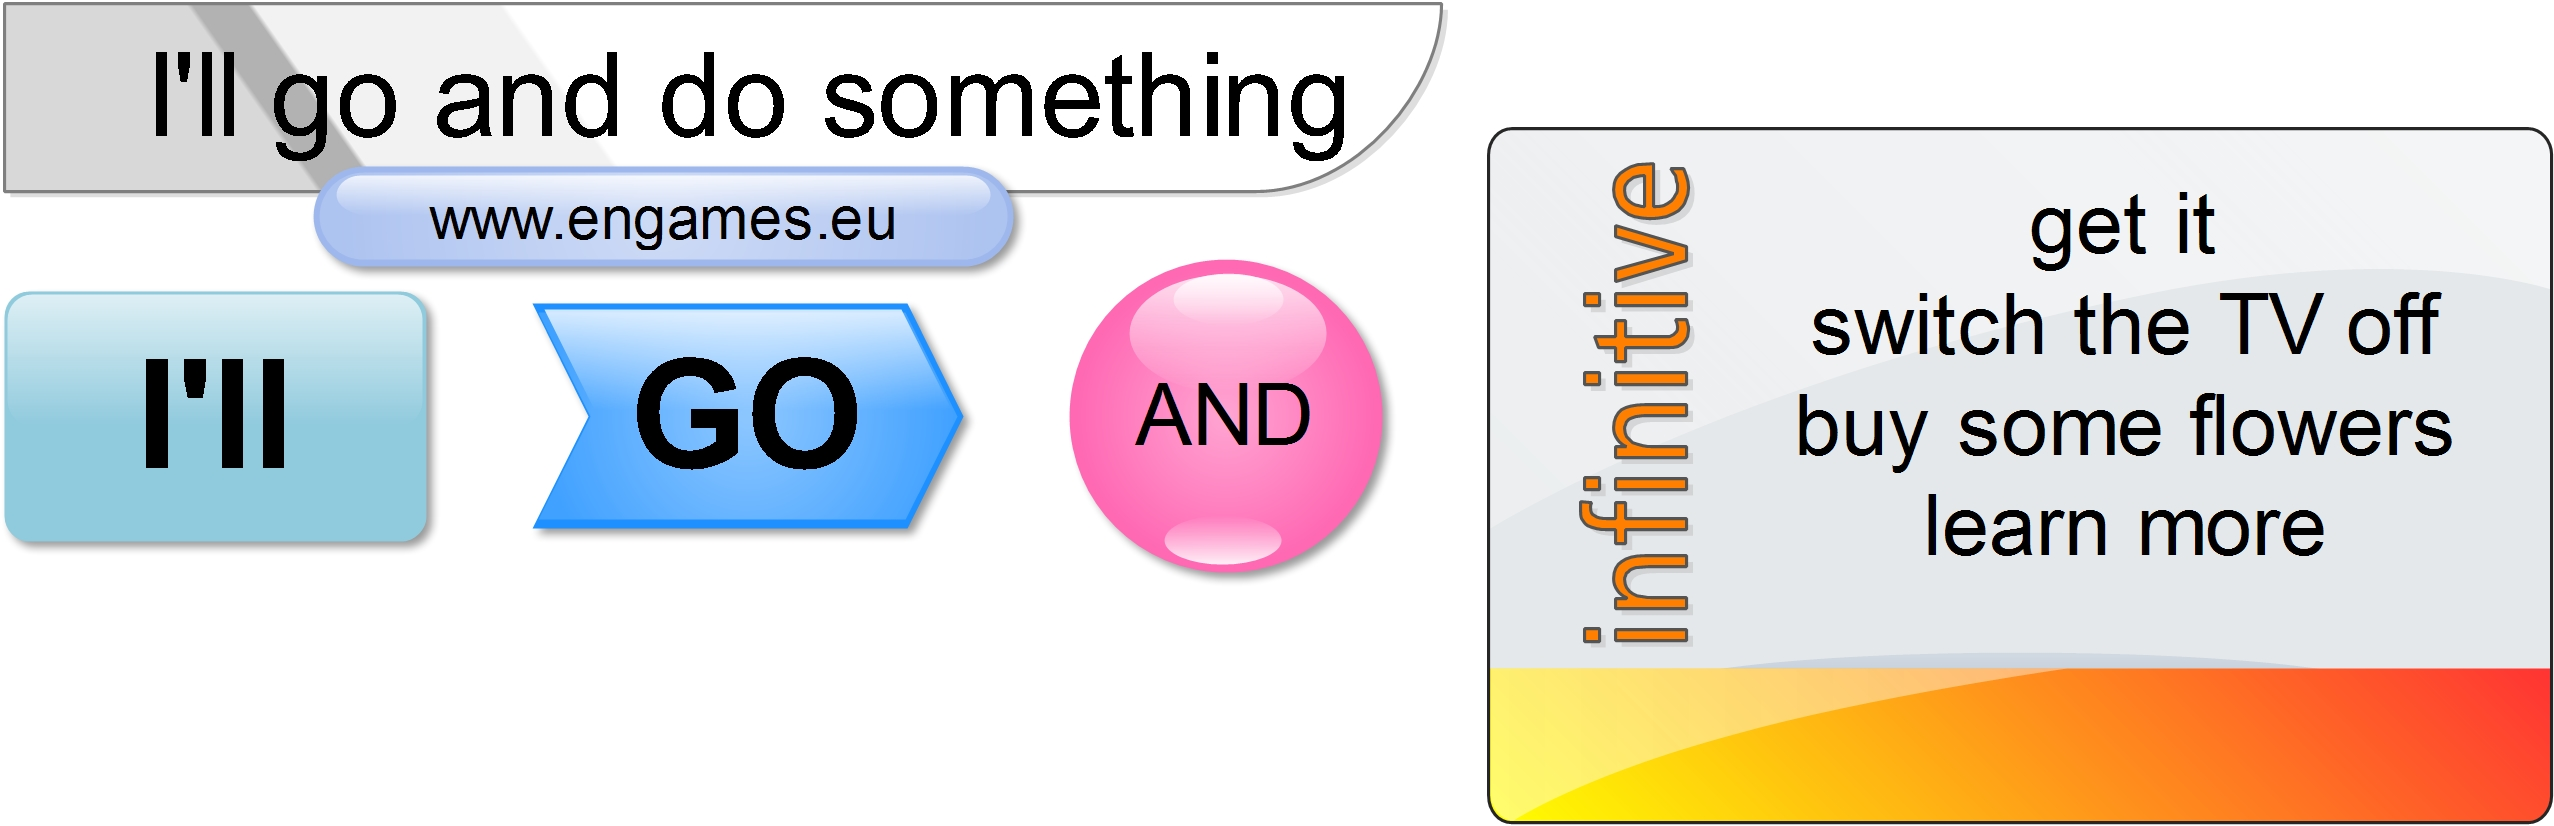 Go and do something mind map